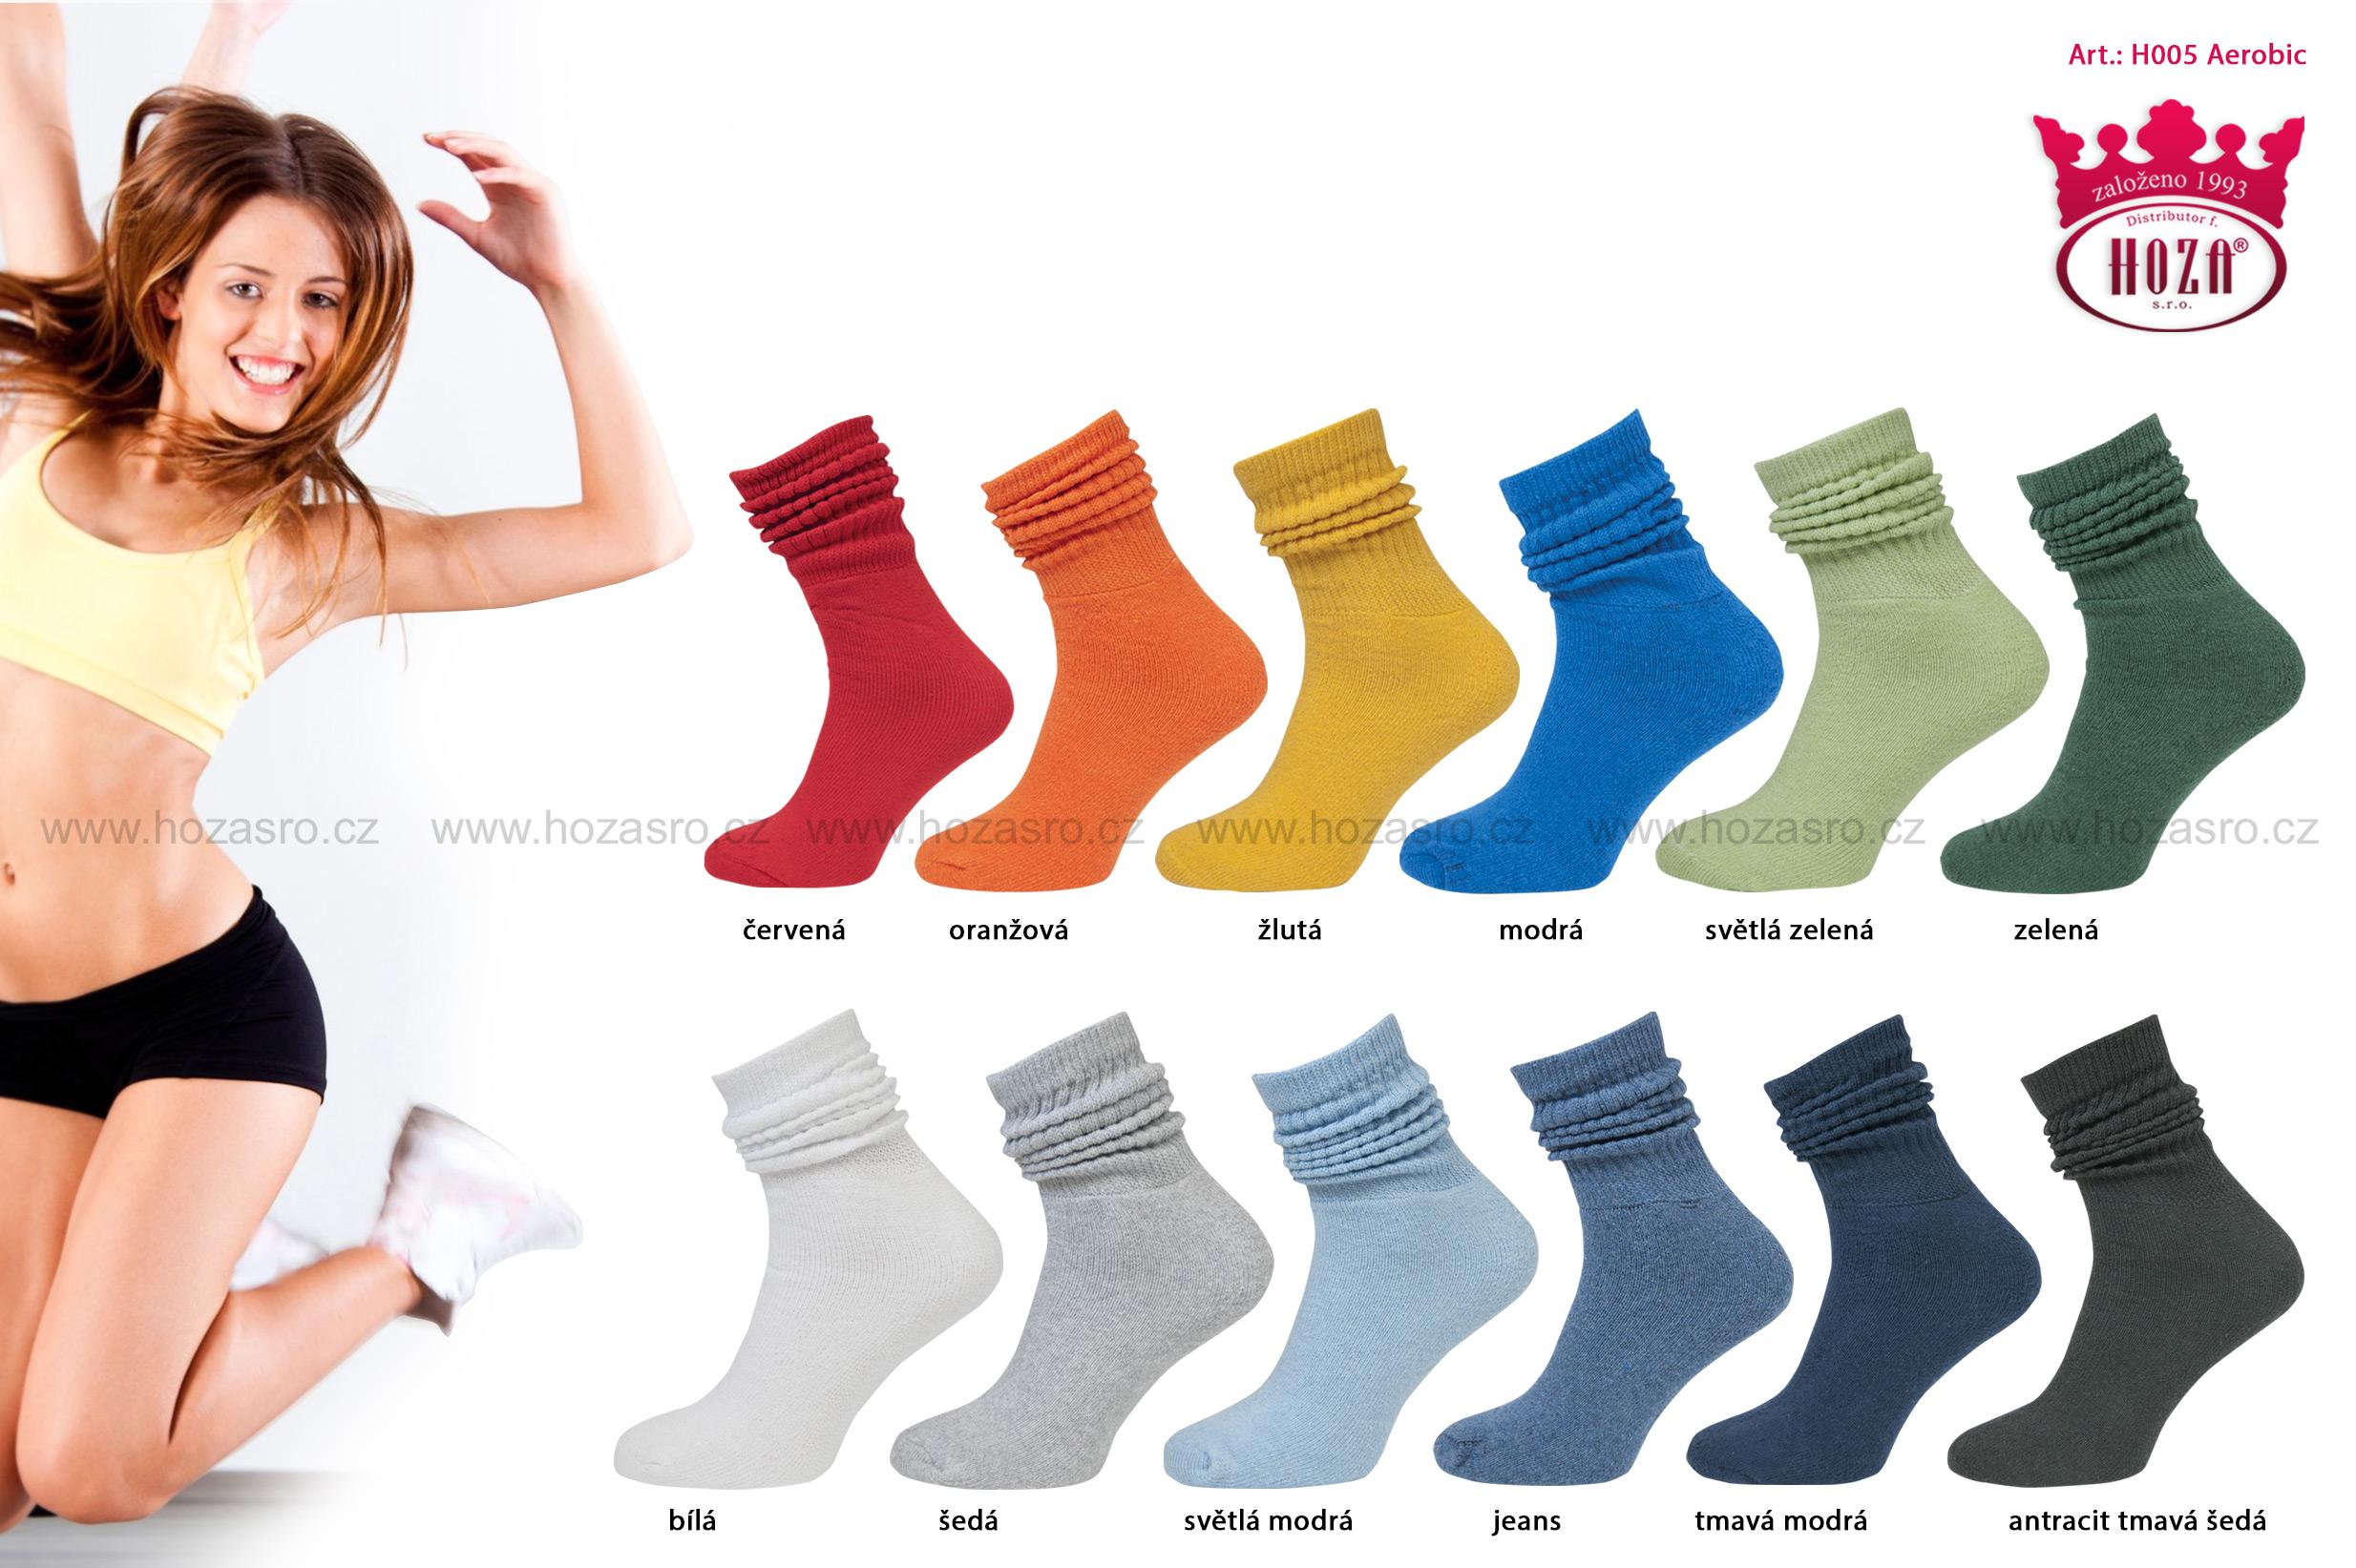 ... H005 Dámské ponožky HOZA Aerobic - černá.  katalog tmb h005 barevne-kombinace.jpg ce29ca7d8e